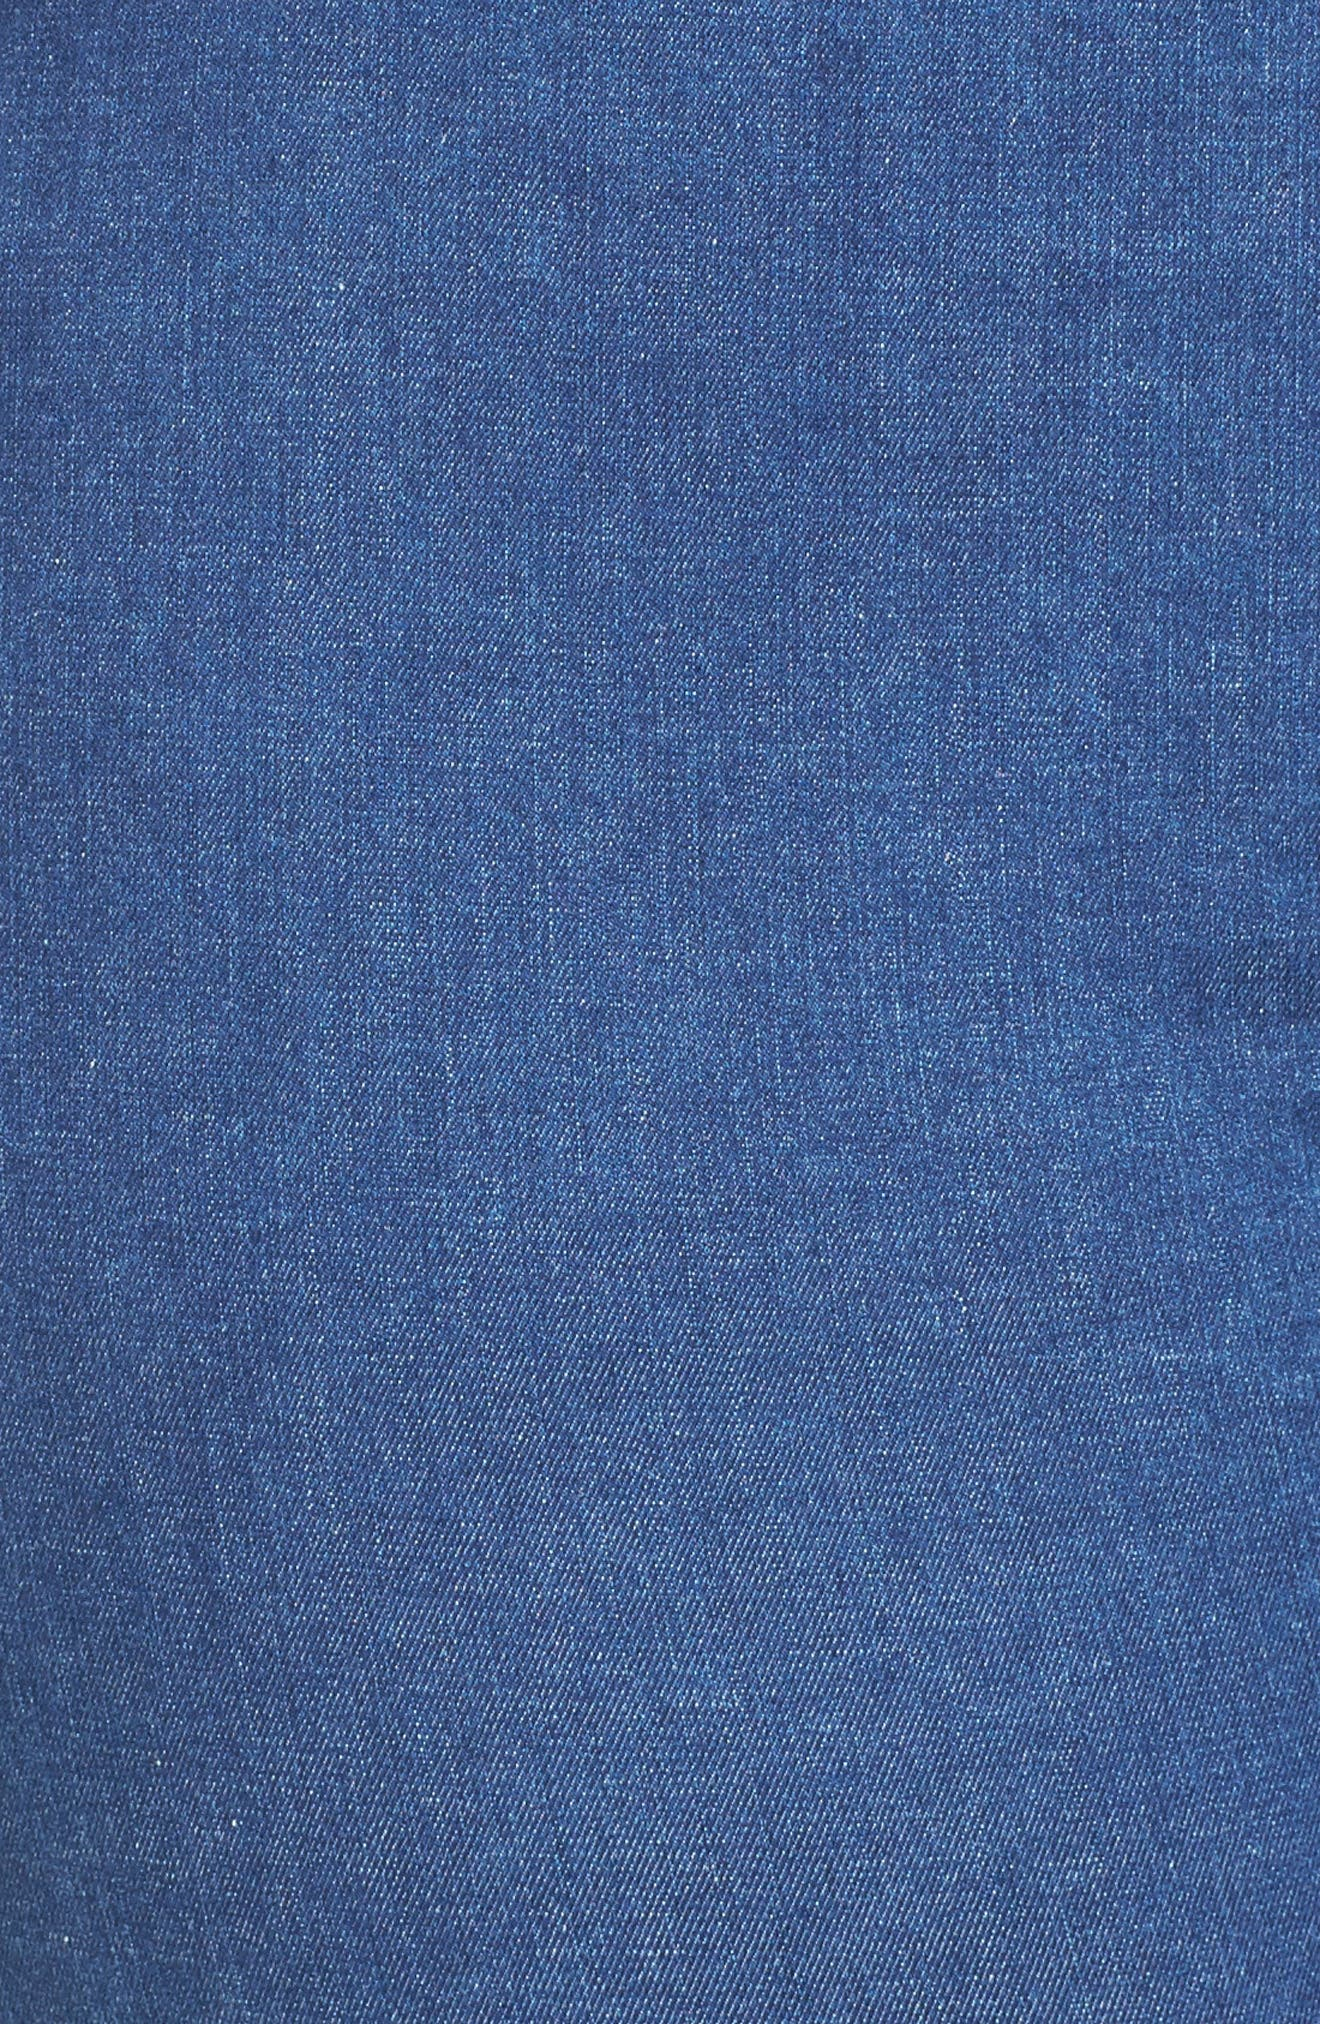 Alternate Image 5  - Foxcroft Nina Slimming Pull-On Capri Jeans (Plus Size)